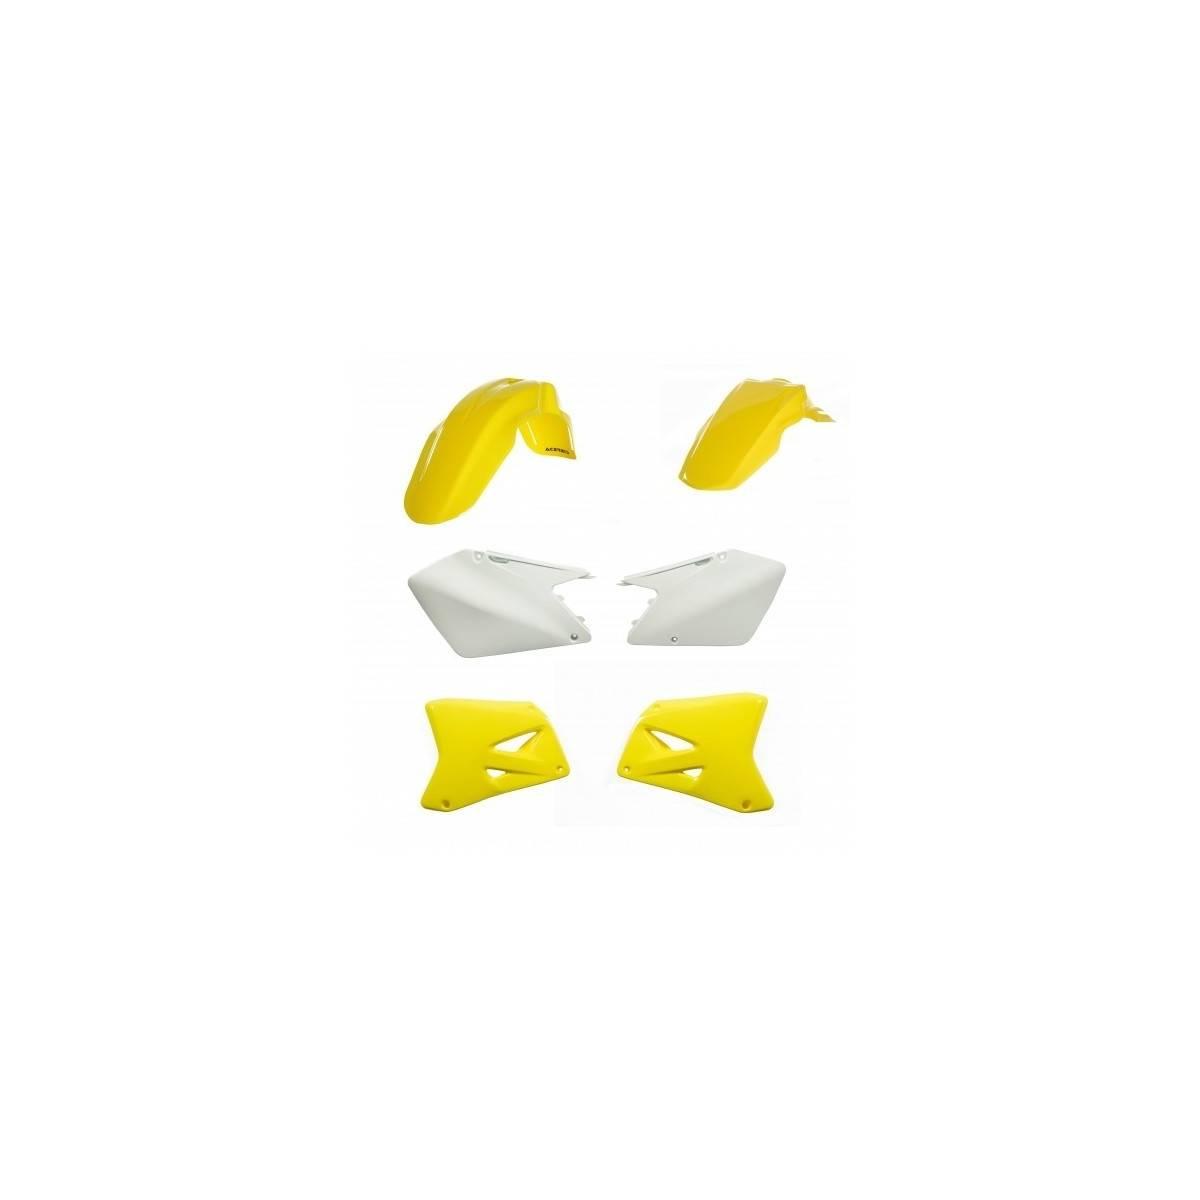 0017562-060 - Kit Plasticos Yzf 250 Yzf 450 14 17 Amarillo